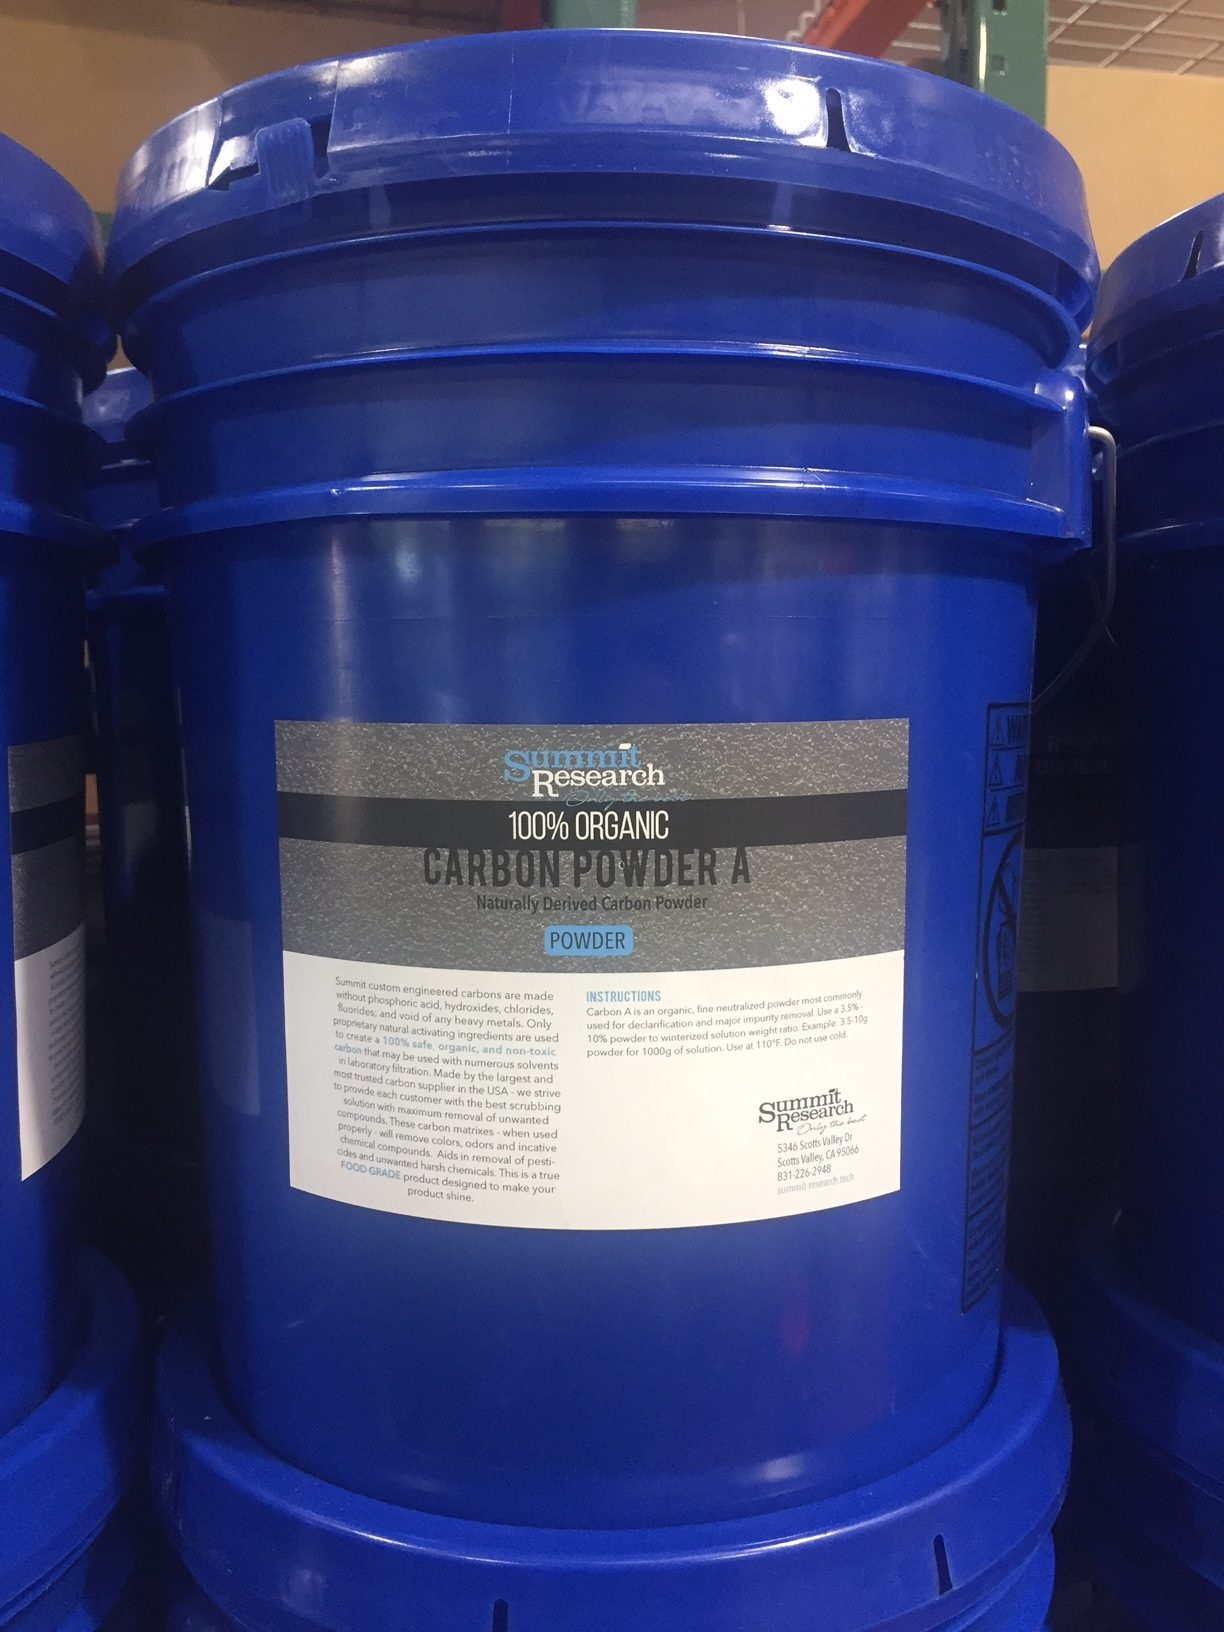 Summit Research - Carbon A Powder 5.4kg (12lb)